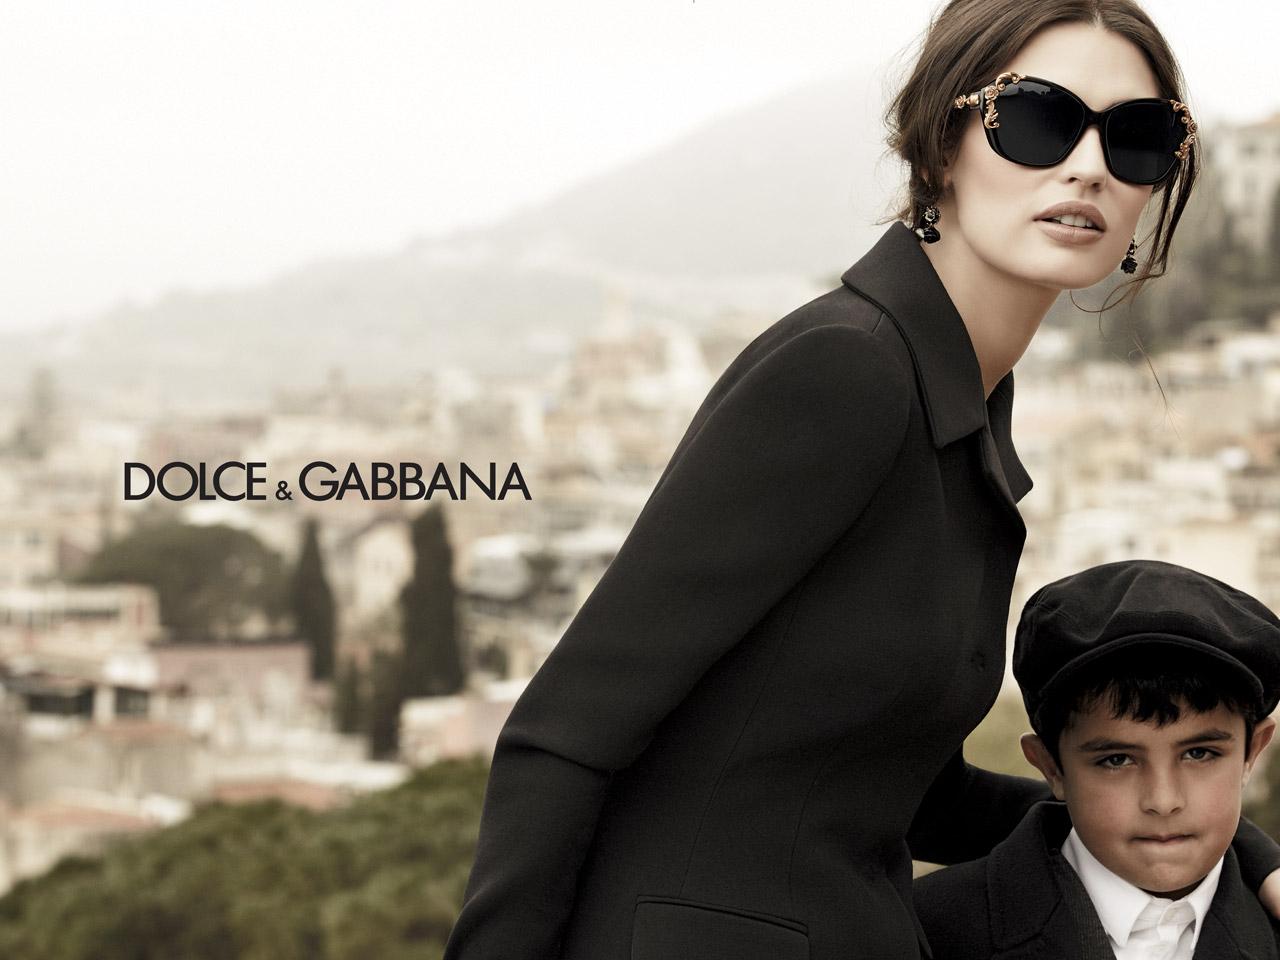 a22191e20d8f 1280x960dolce-gabbana-eyewear-women-sunglasses-adv-fw-2013-a1.jpg